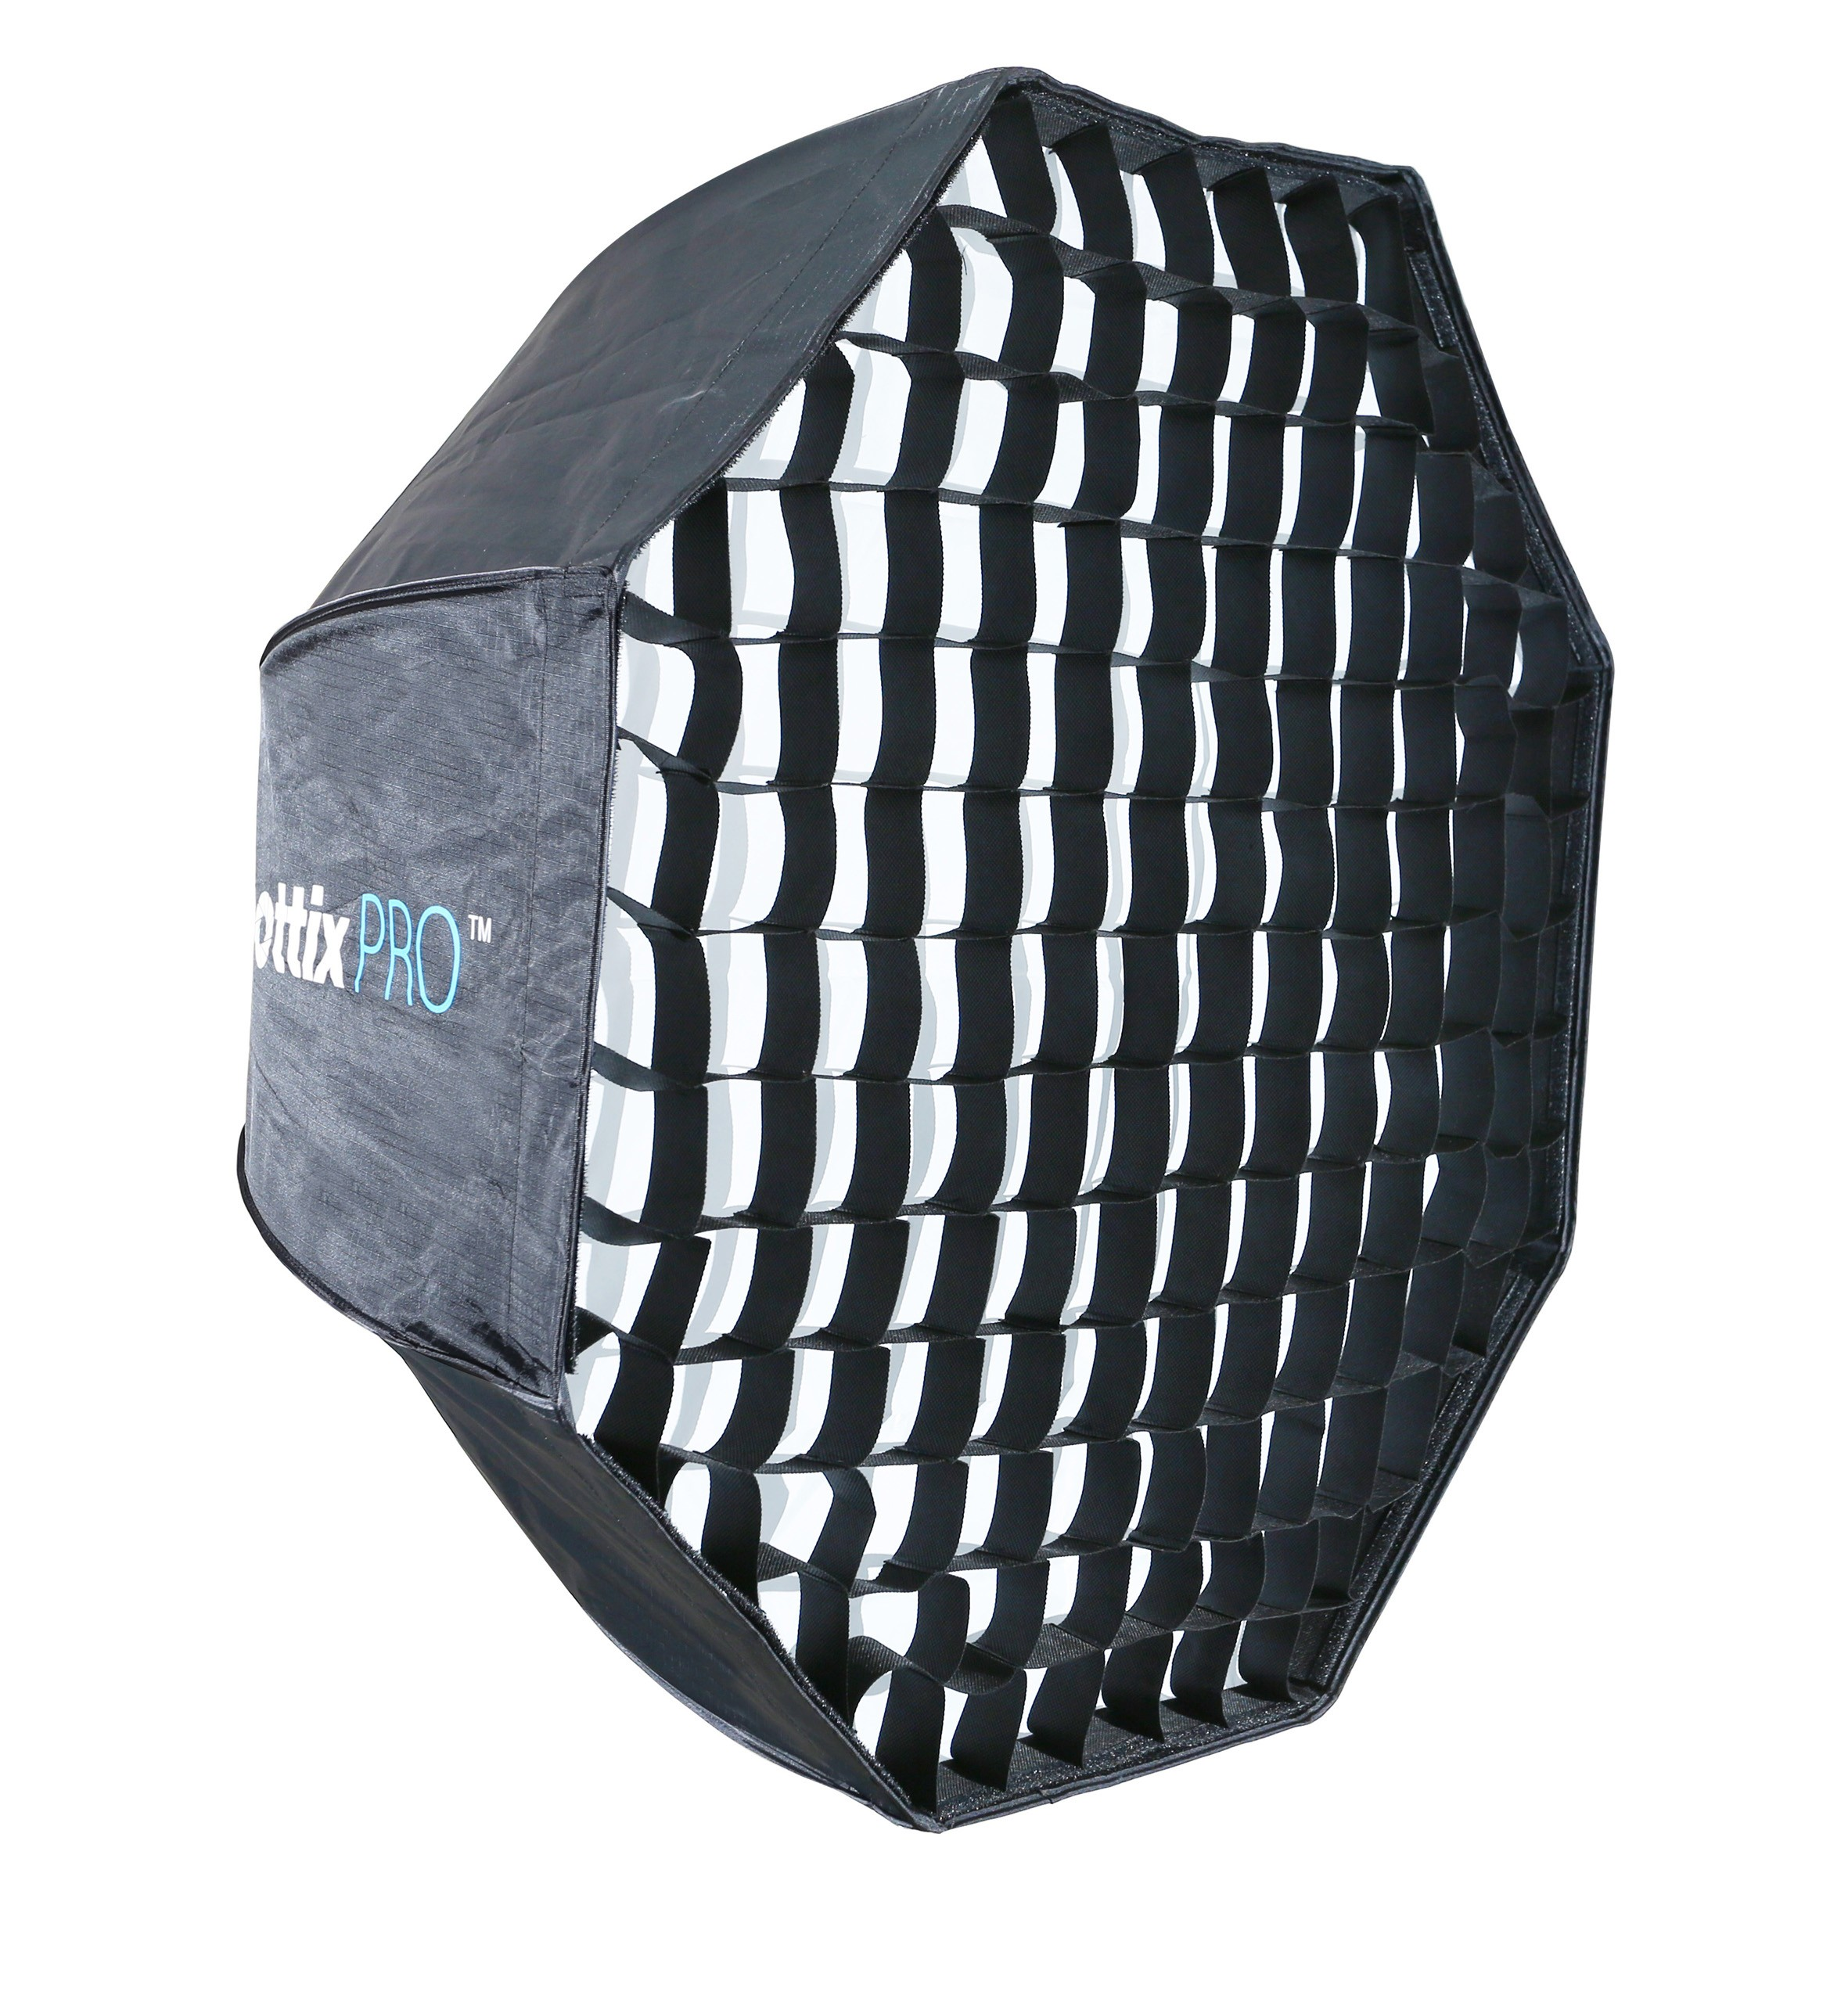 82484_-_phottix_pro_easy_up_hd_umbrella_octa_softbox_with_grid_80_cm_1